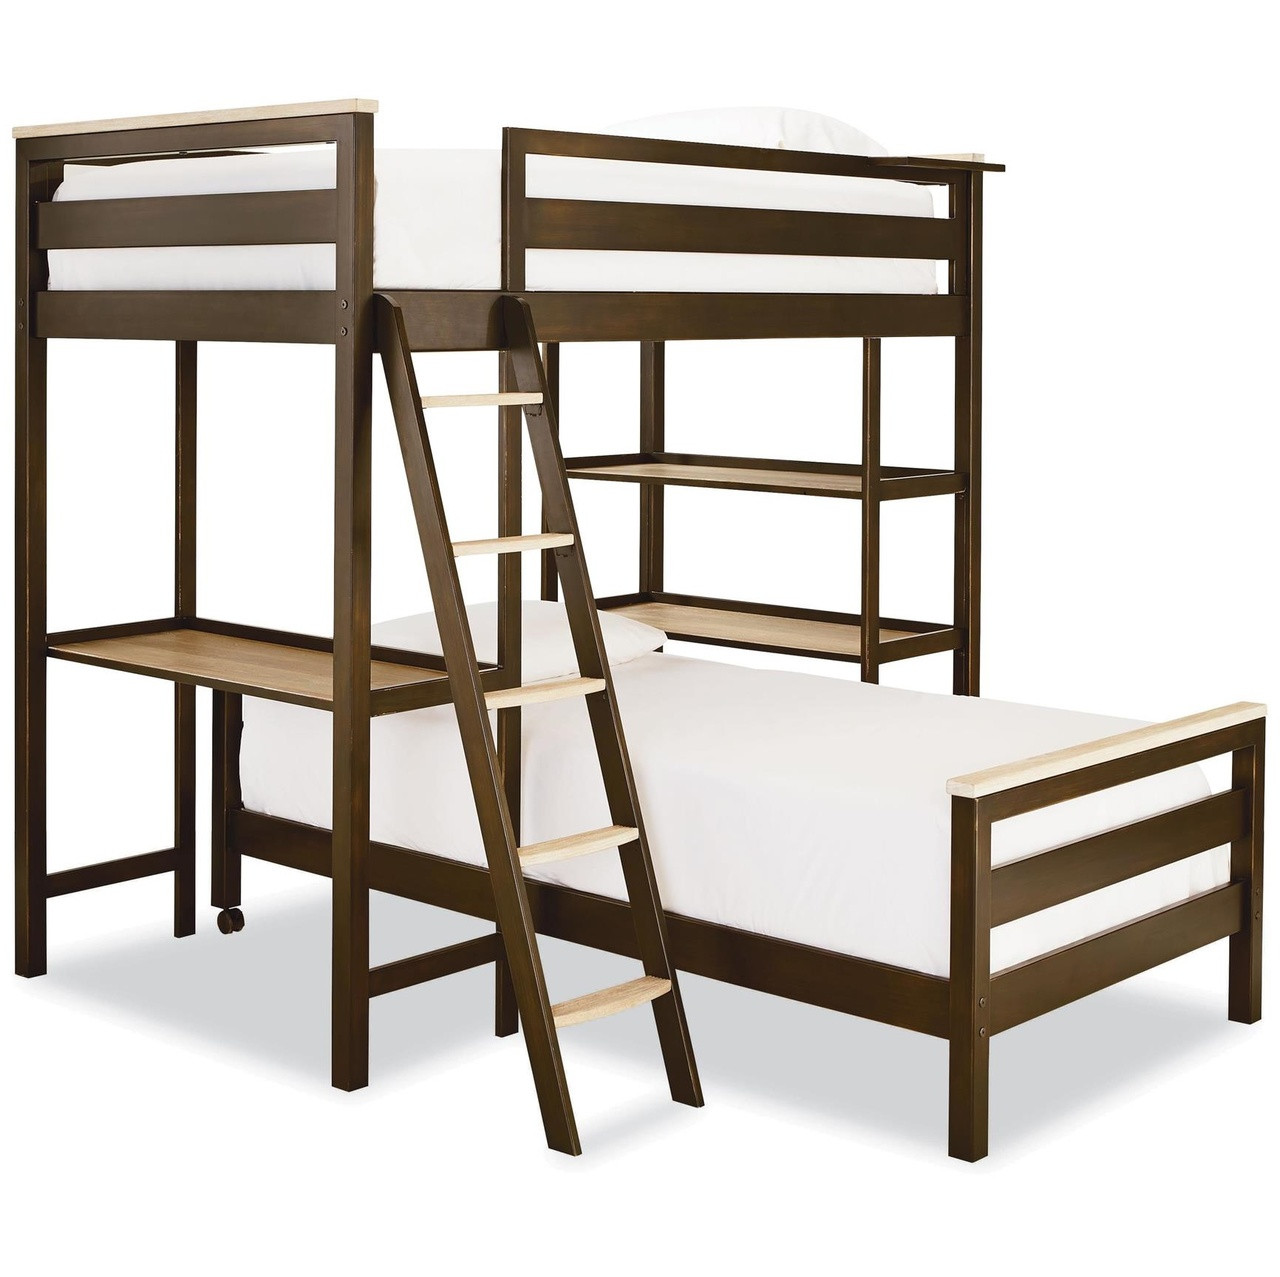 #MyRoom Modern Kids Twin Metal Loft Bunk Bed With Desk